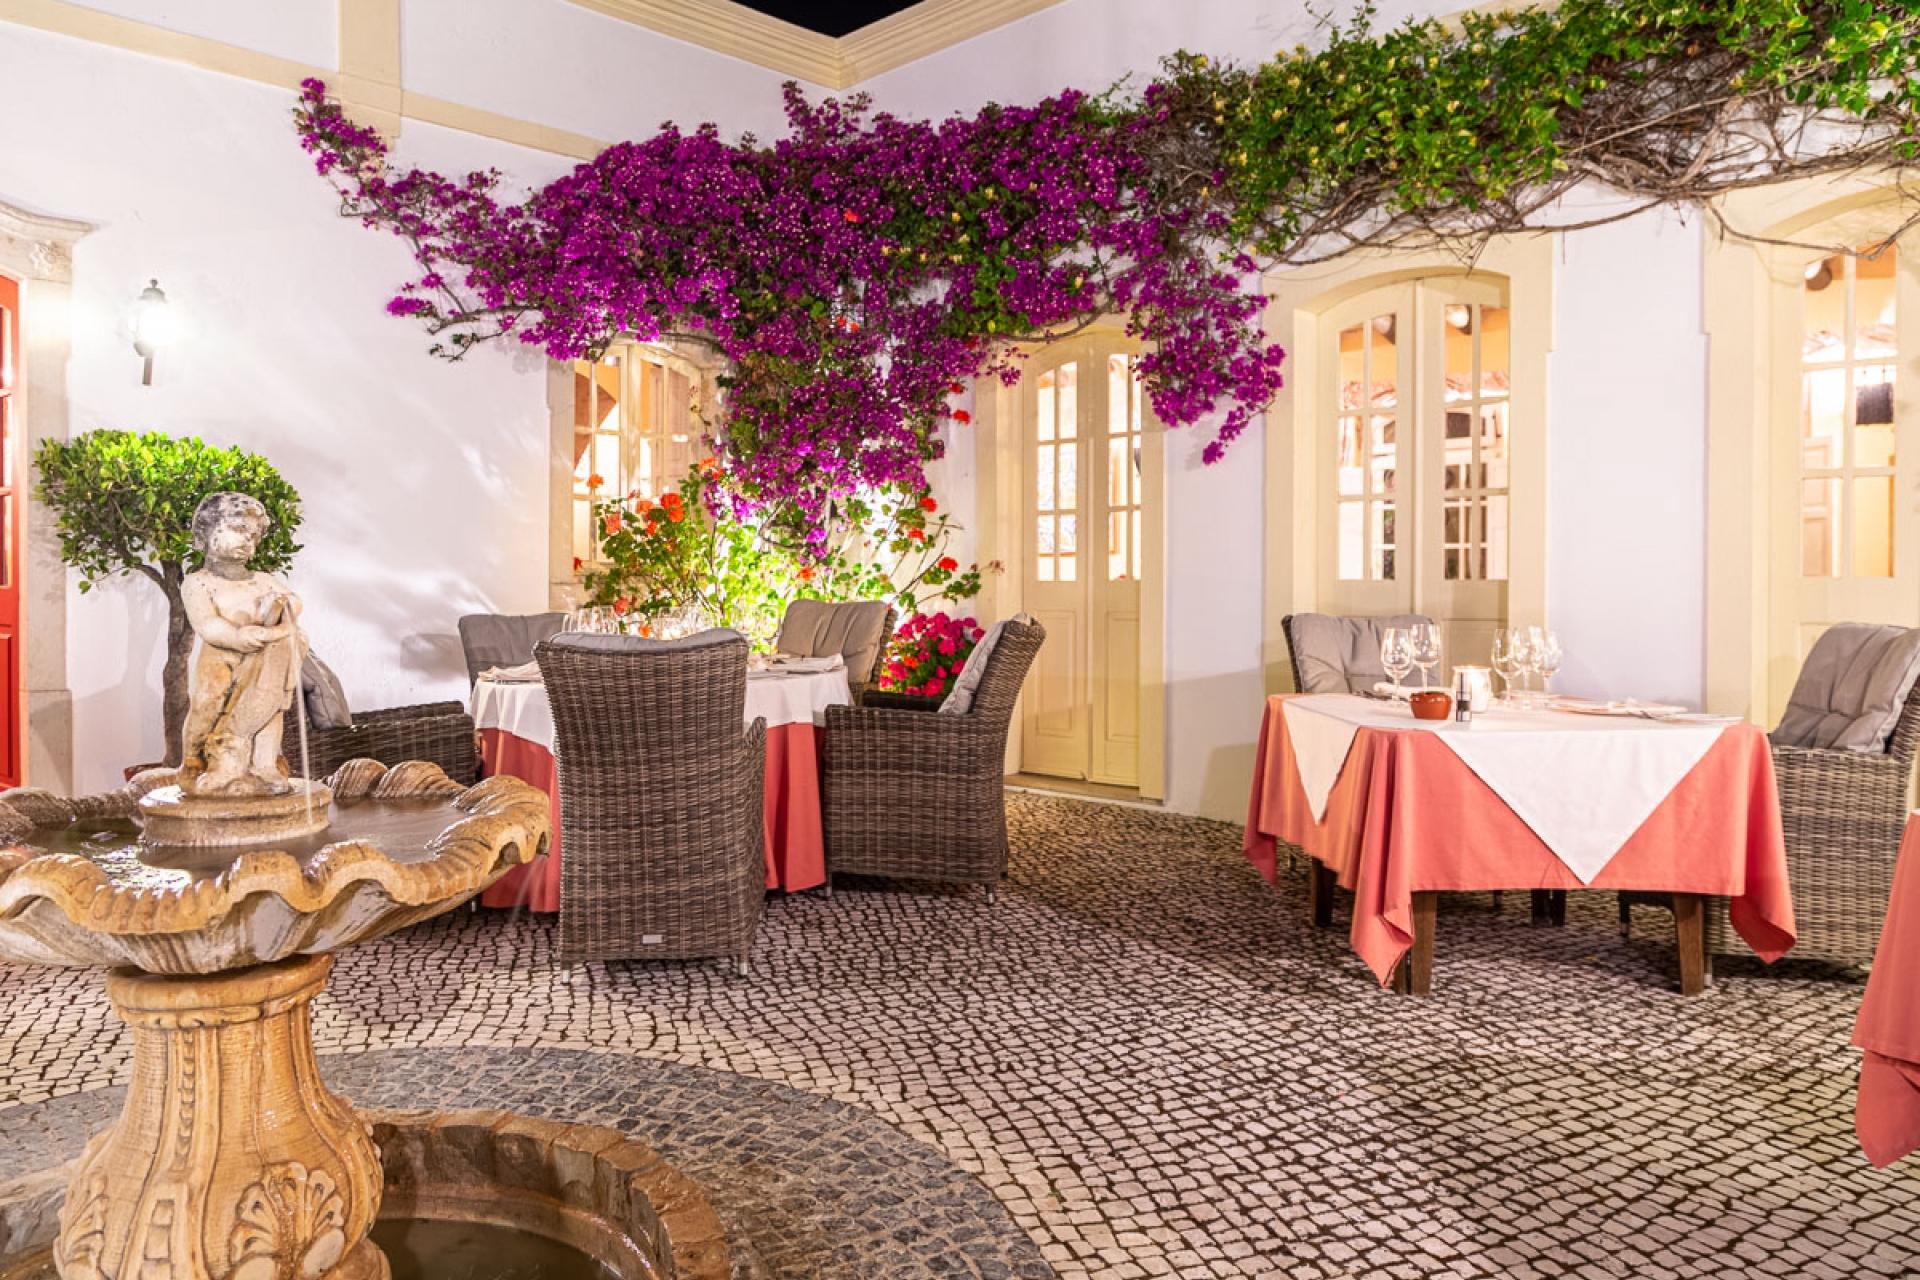 AlgarveCool_Comer_Restaurante_Pequeno_Mundo